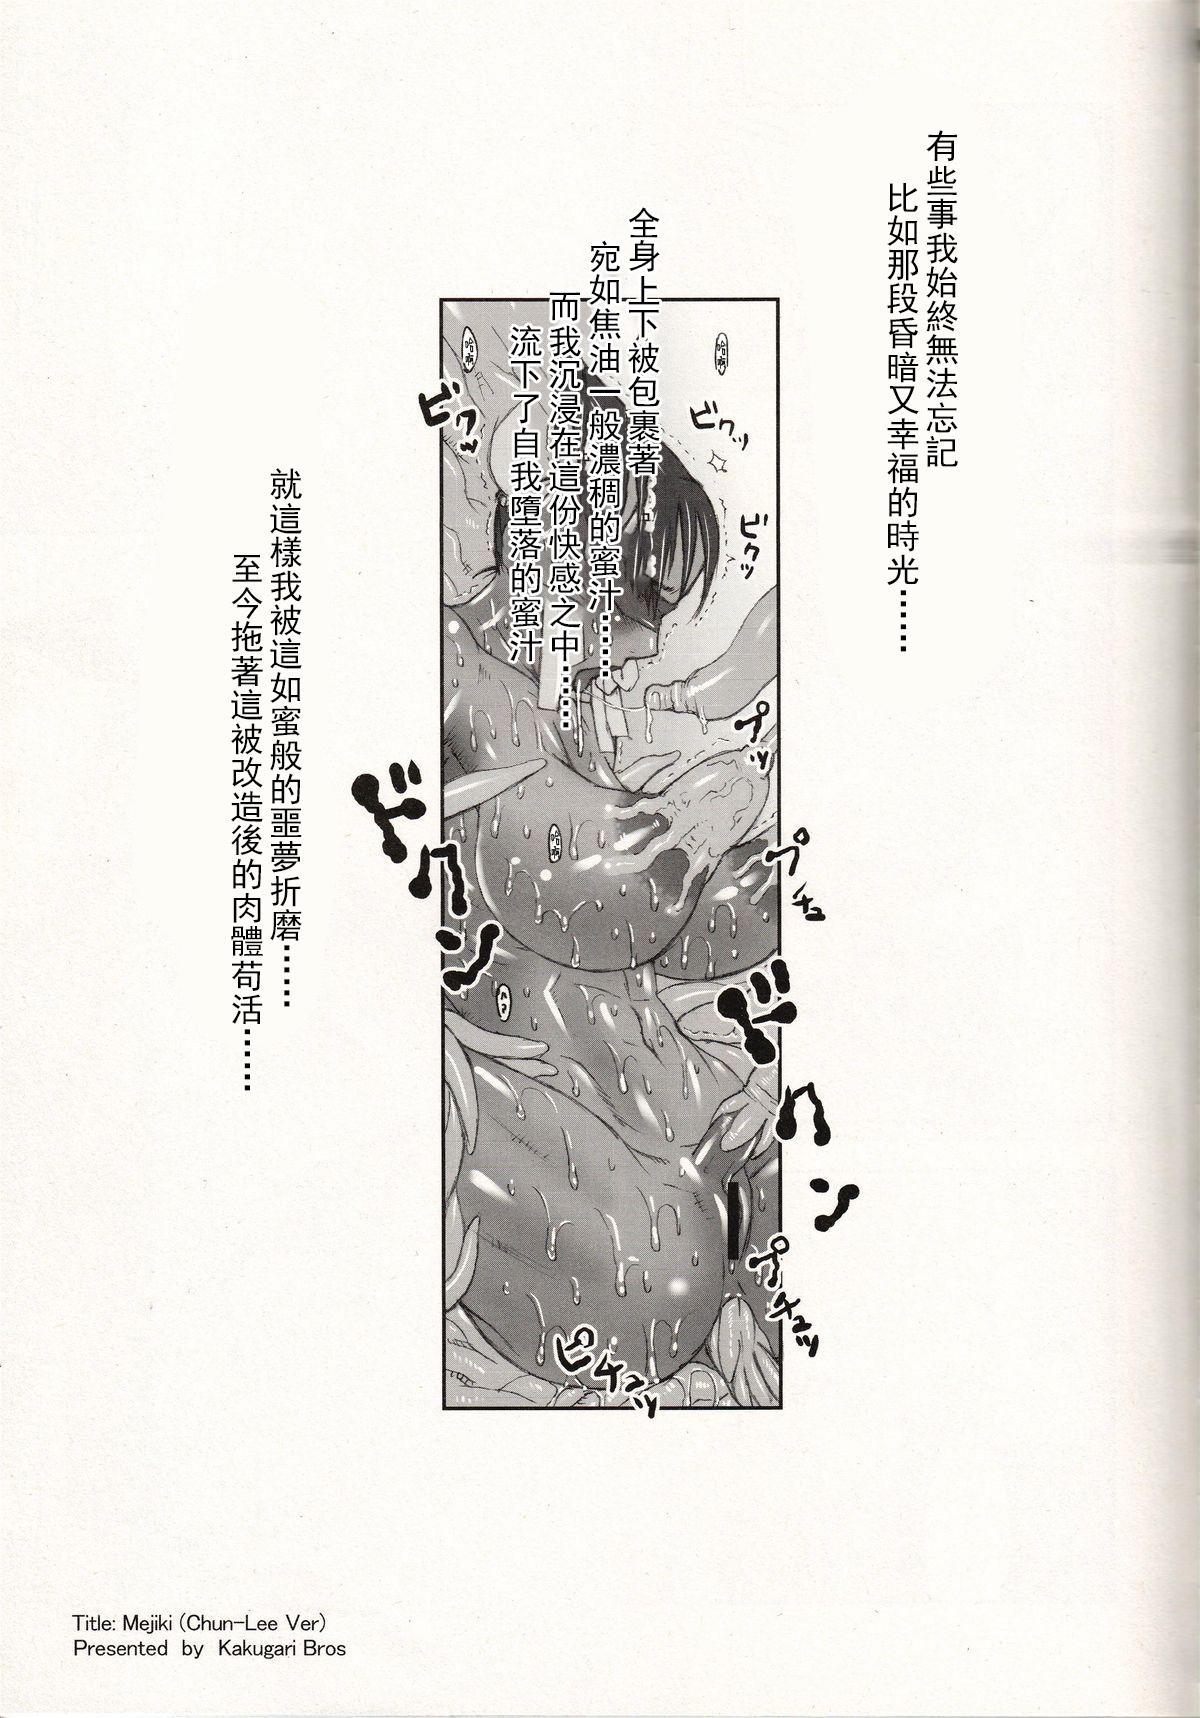 (C70) [Niku Ringo (Kakugari Kyoudai)] NIPPON Onna HEROINE 2 (Darkstalkers, Street Fighter II)[Chinese]【不可视汉化】 3